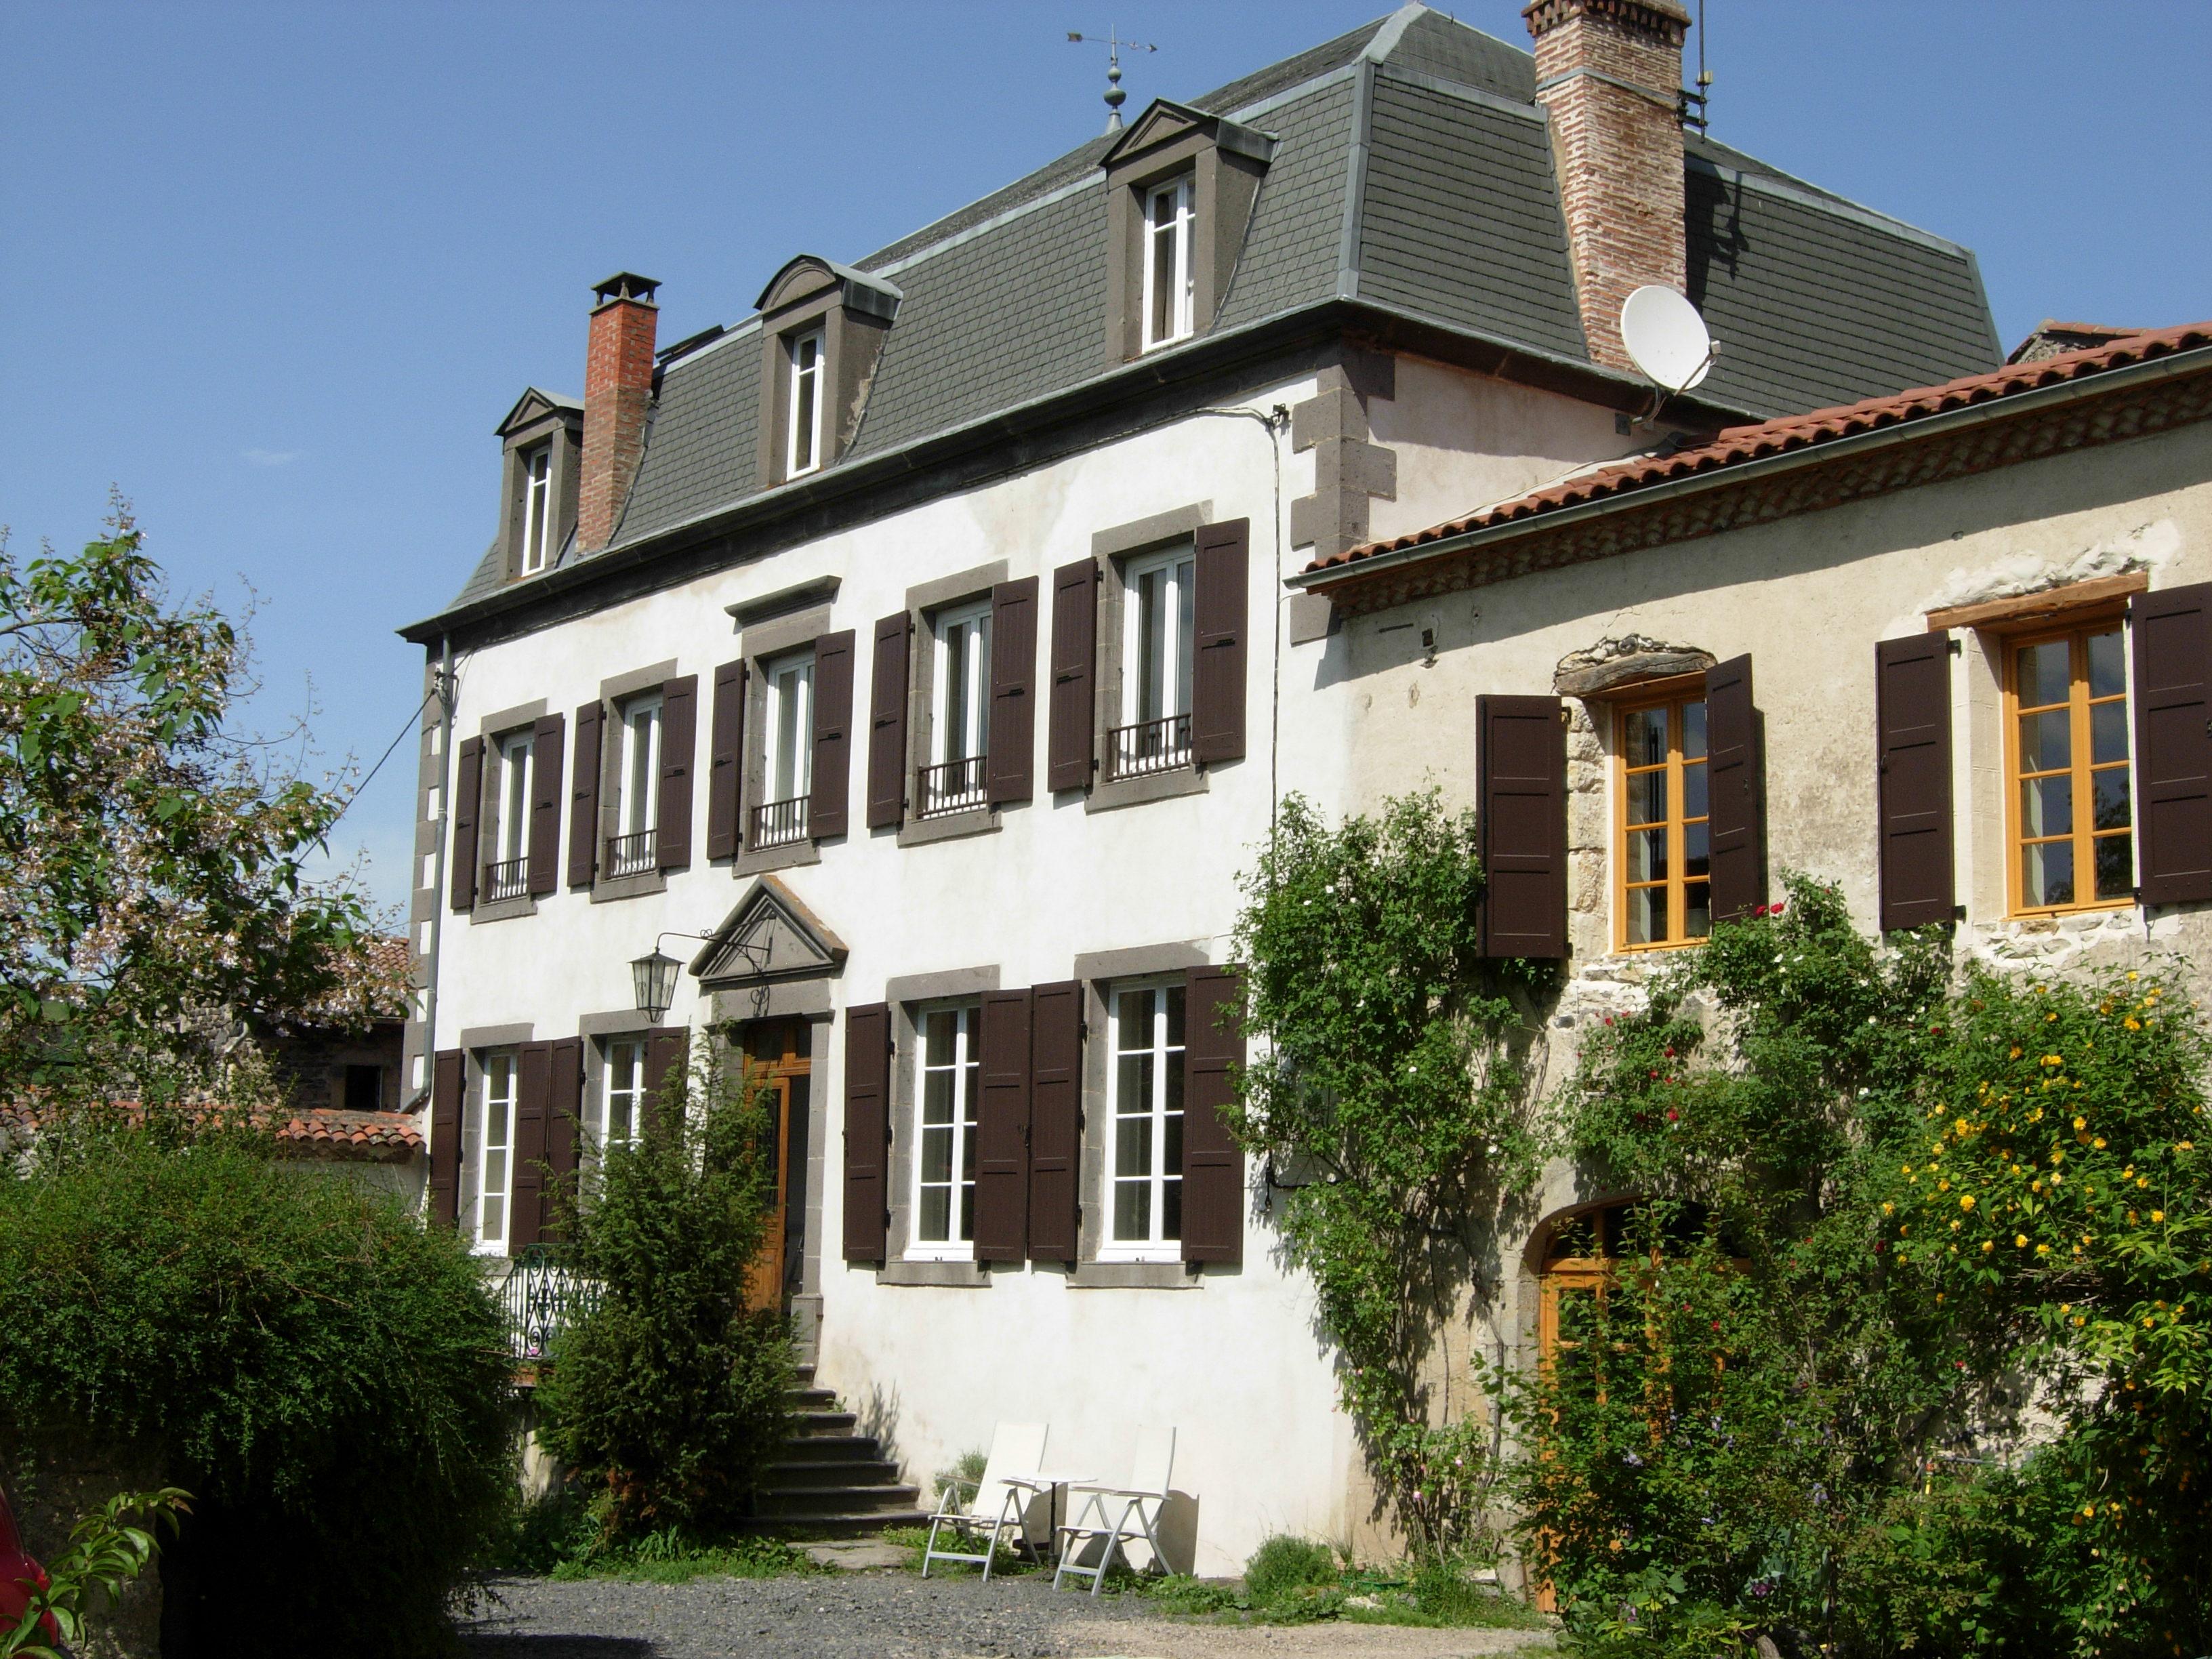 La Maison Bourgeoise